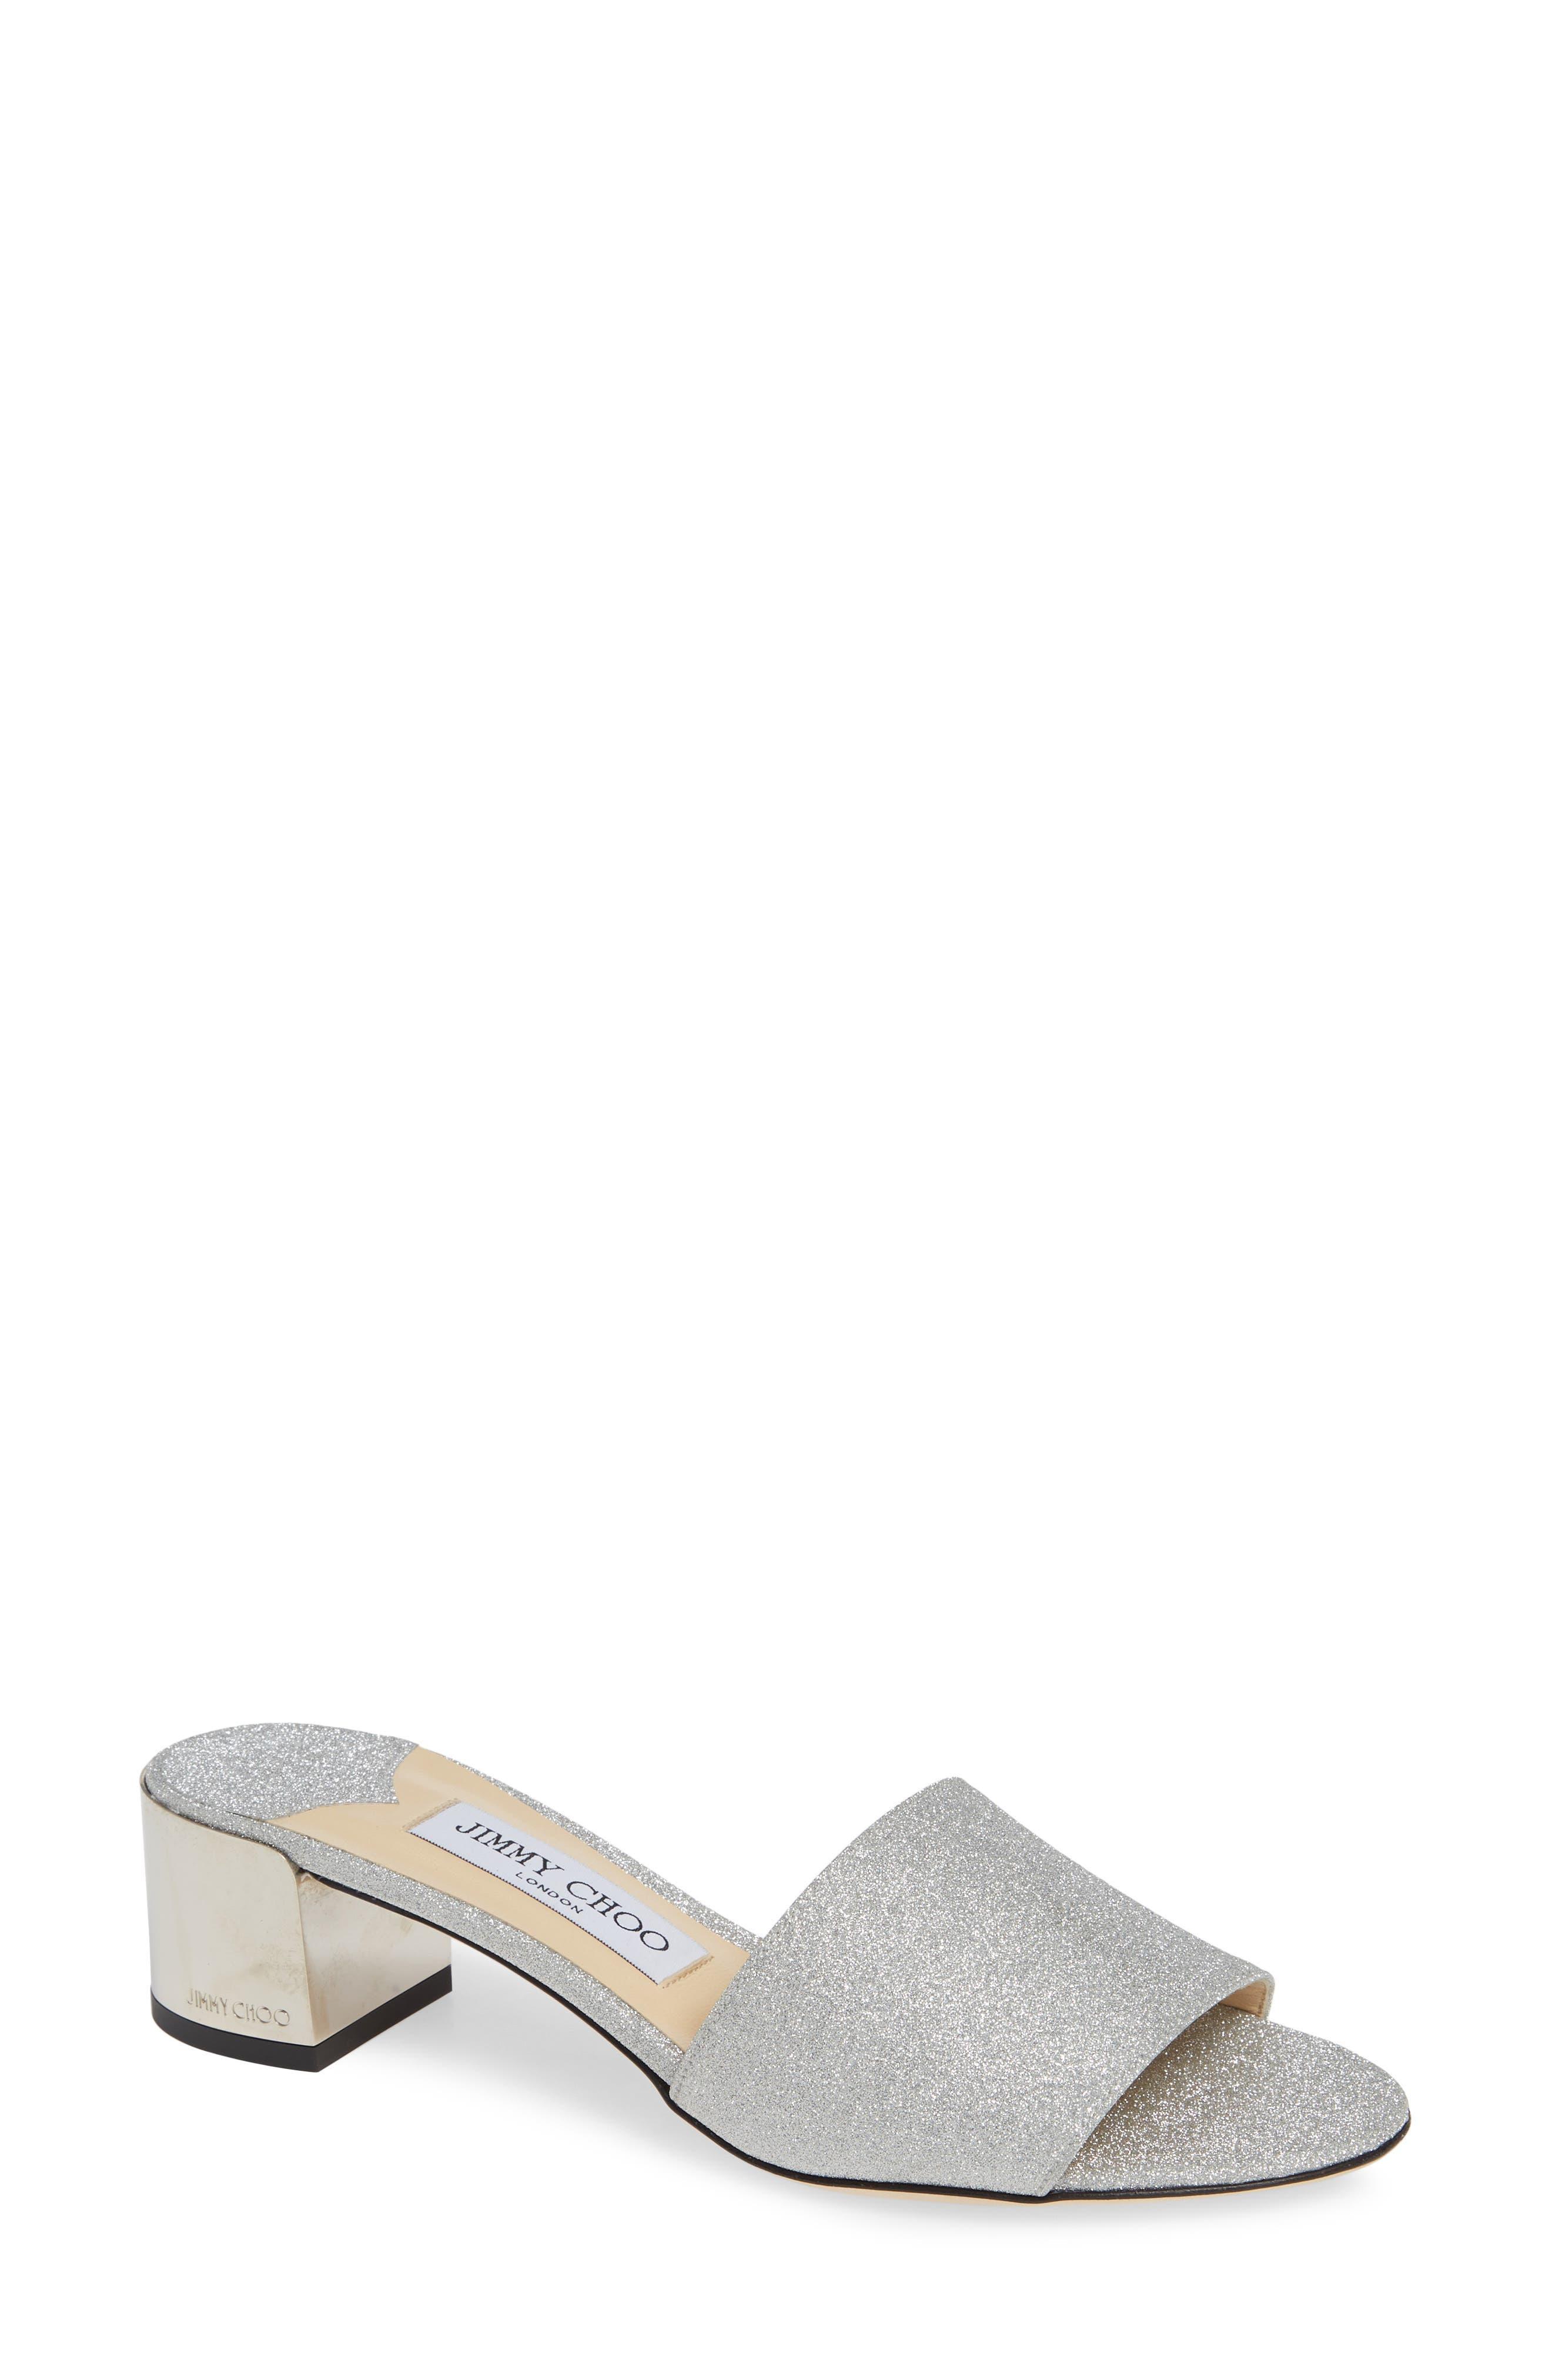 Jimmy Choo Joni Slide Sandal